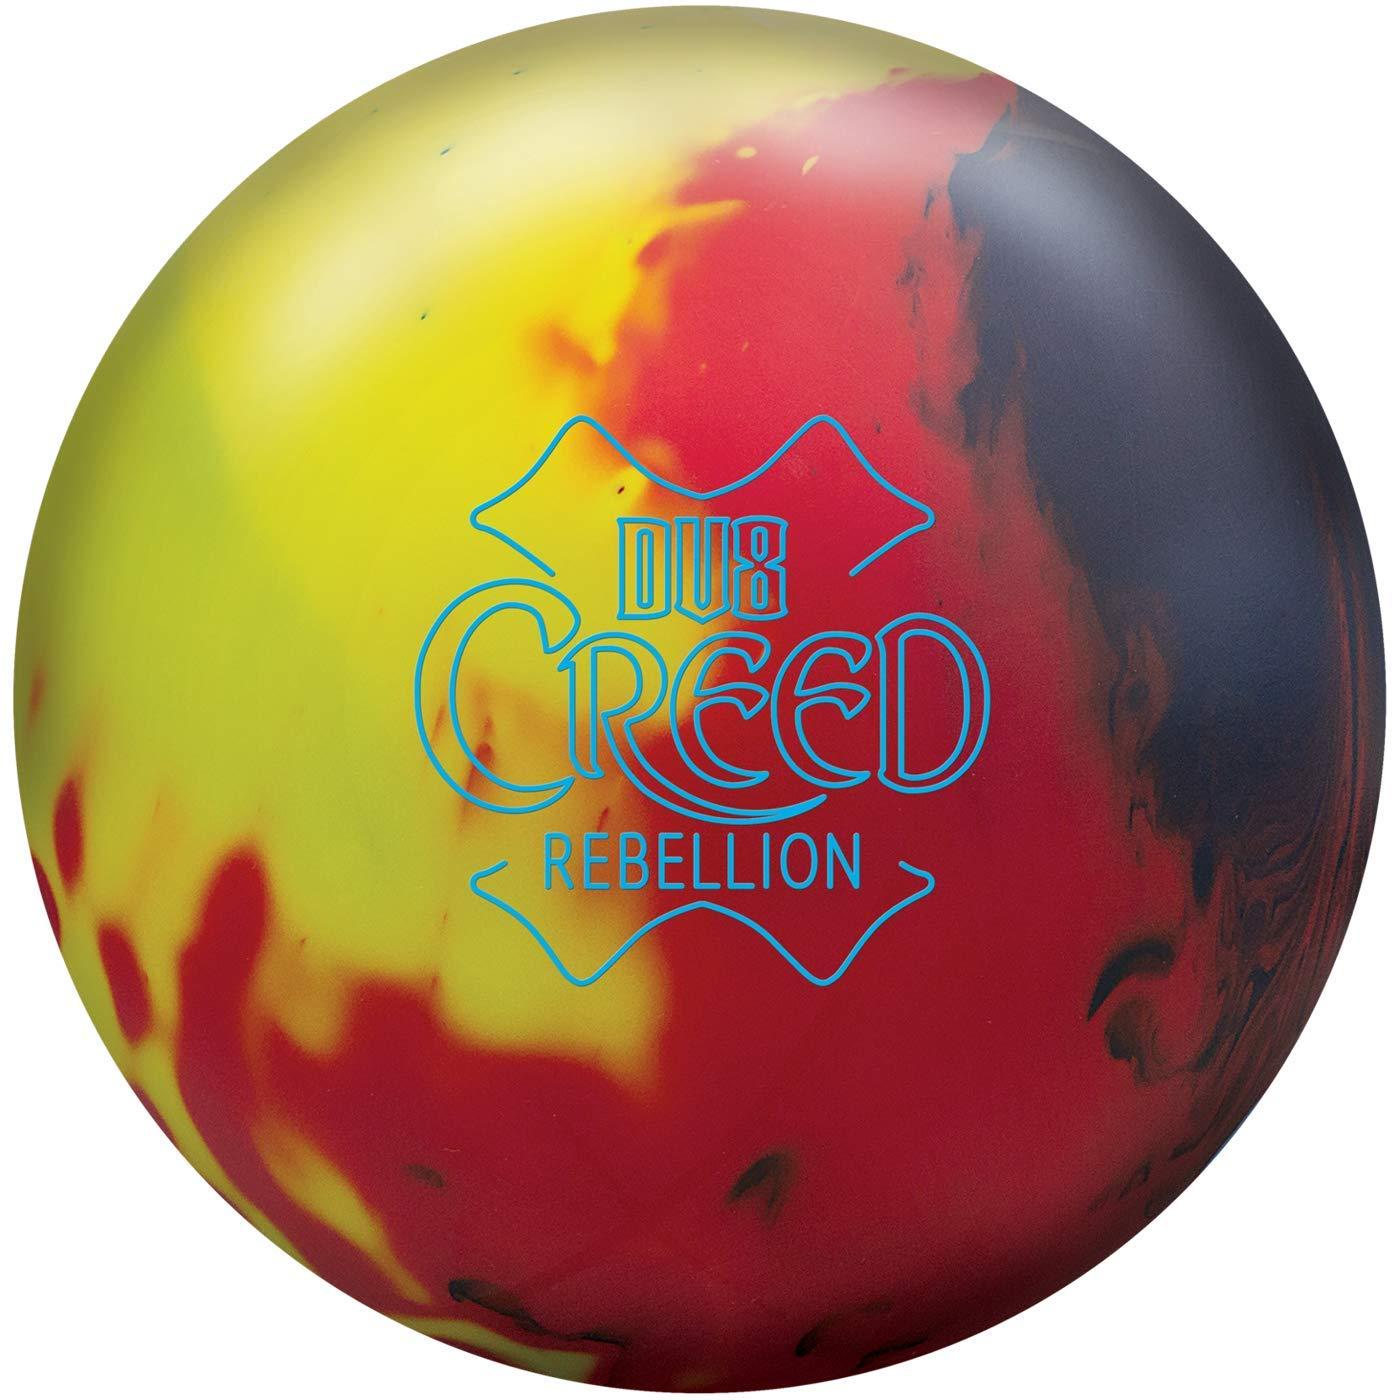 dv8 dv8ヒットマンEnforcer製品Bowlingボーリングball-ネイビー/オレンジ/シルバー B07DR26HQ3 16lbs